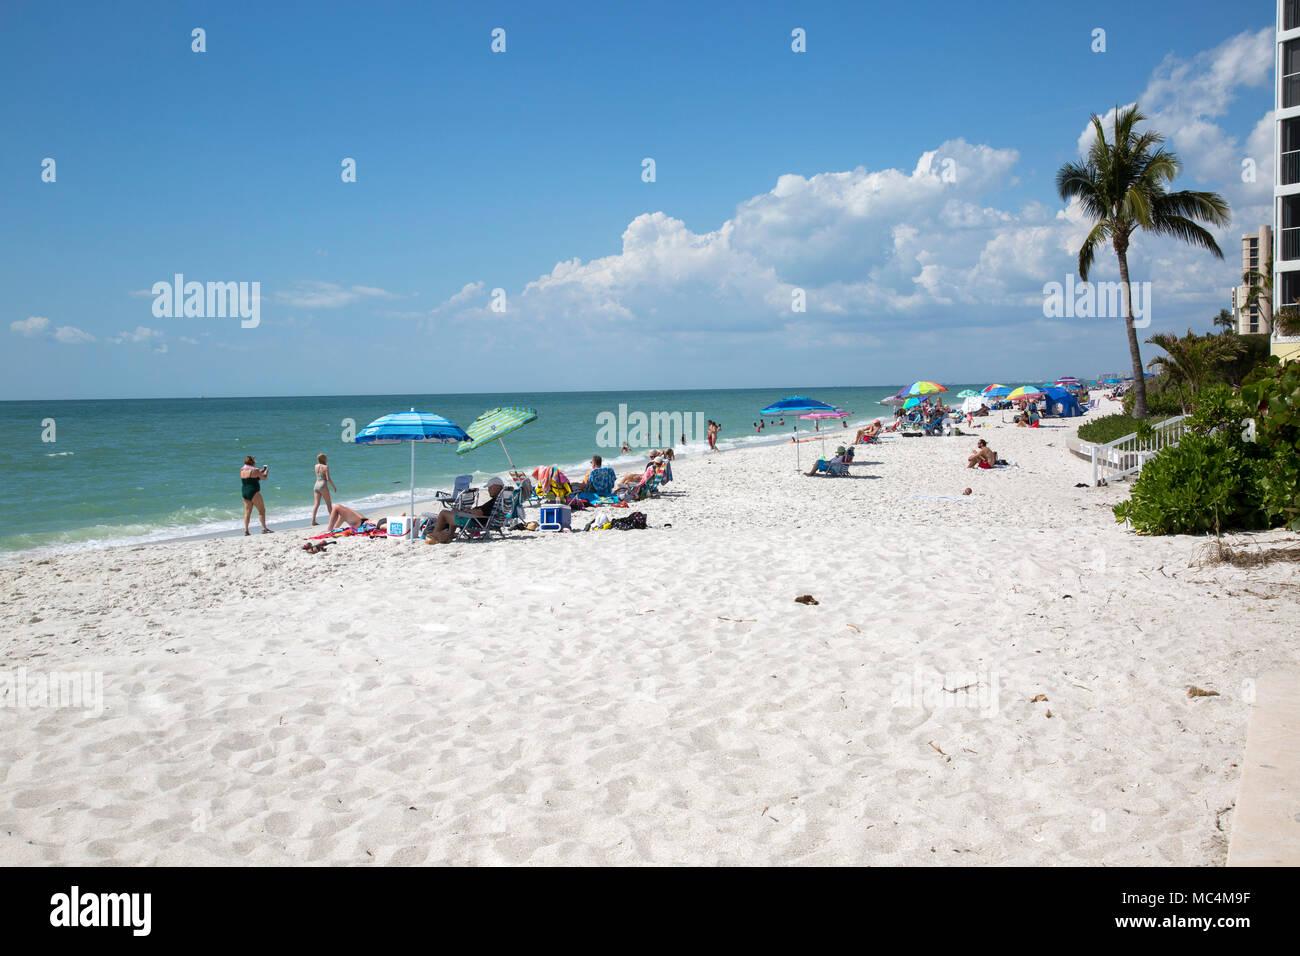 Vacationers in Naples, Florida enjoying beach activities. Sunbathing and having fun on the beach. Stock Photo